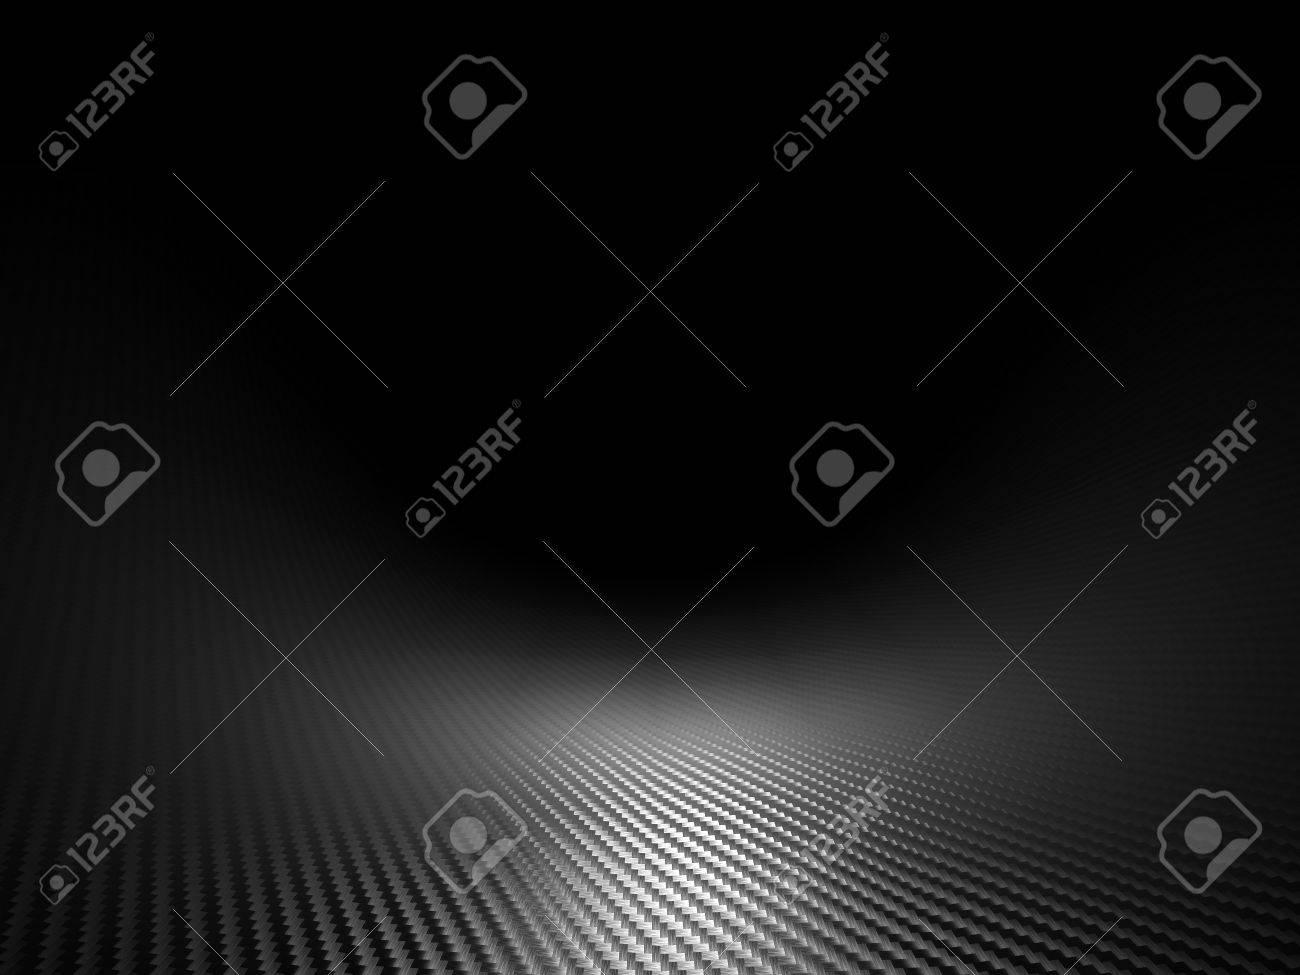 3d image of classic carbon fiber texture - 48342597